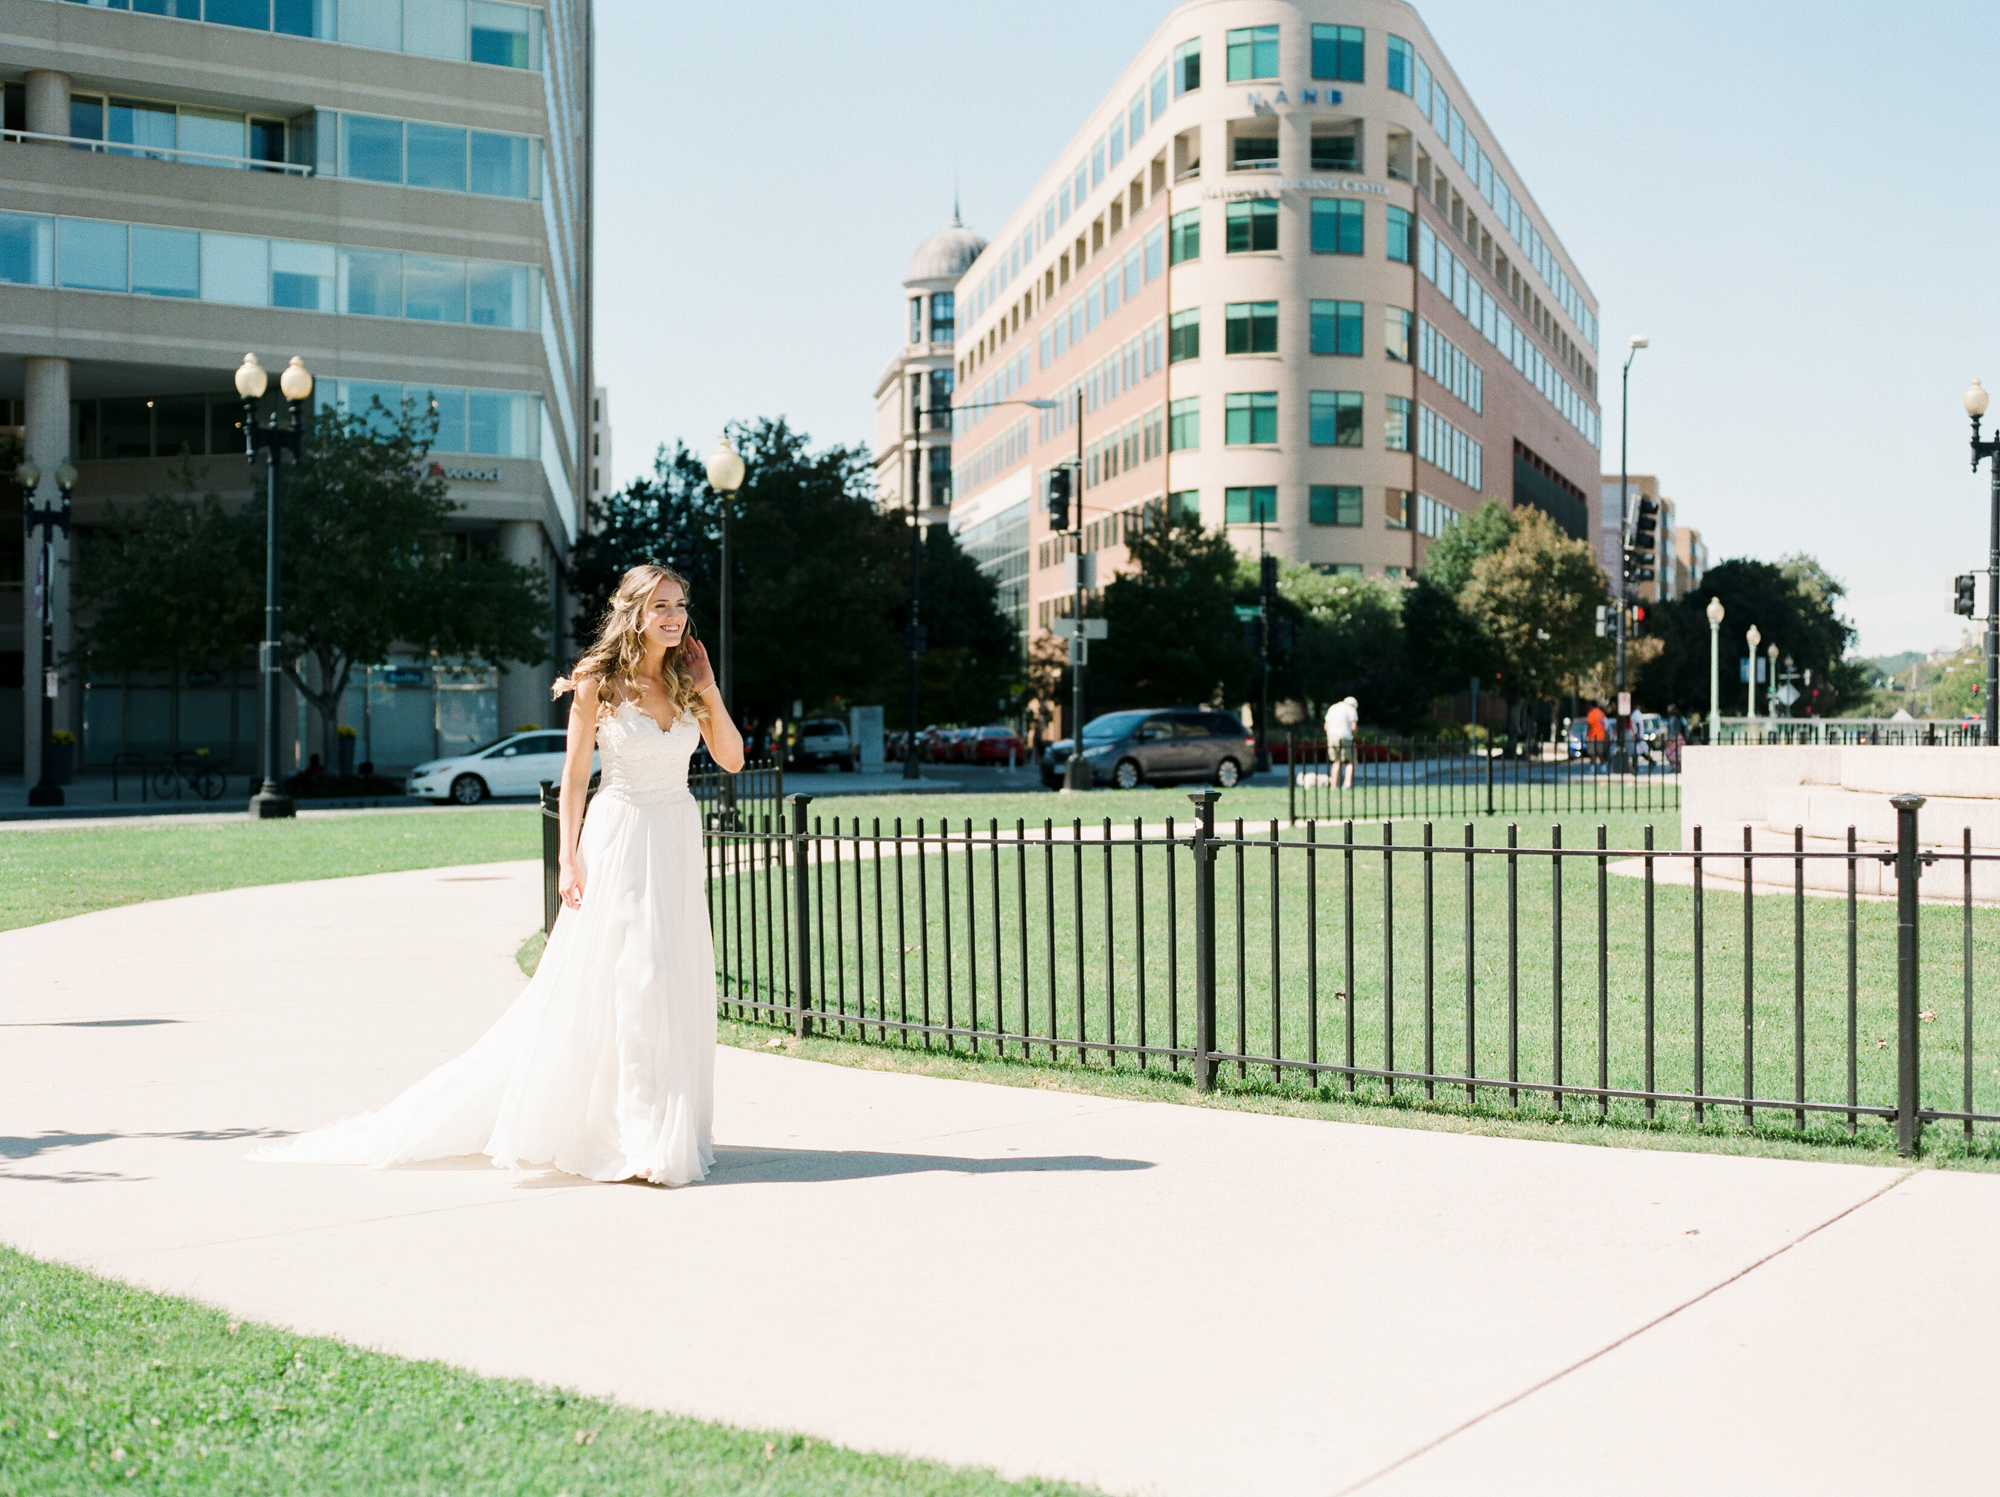 LongView-Gallery-Wedding-Art-Washington-DC-Film-Photographer-6.jpg